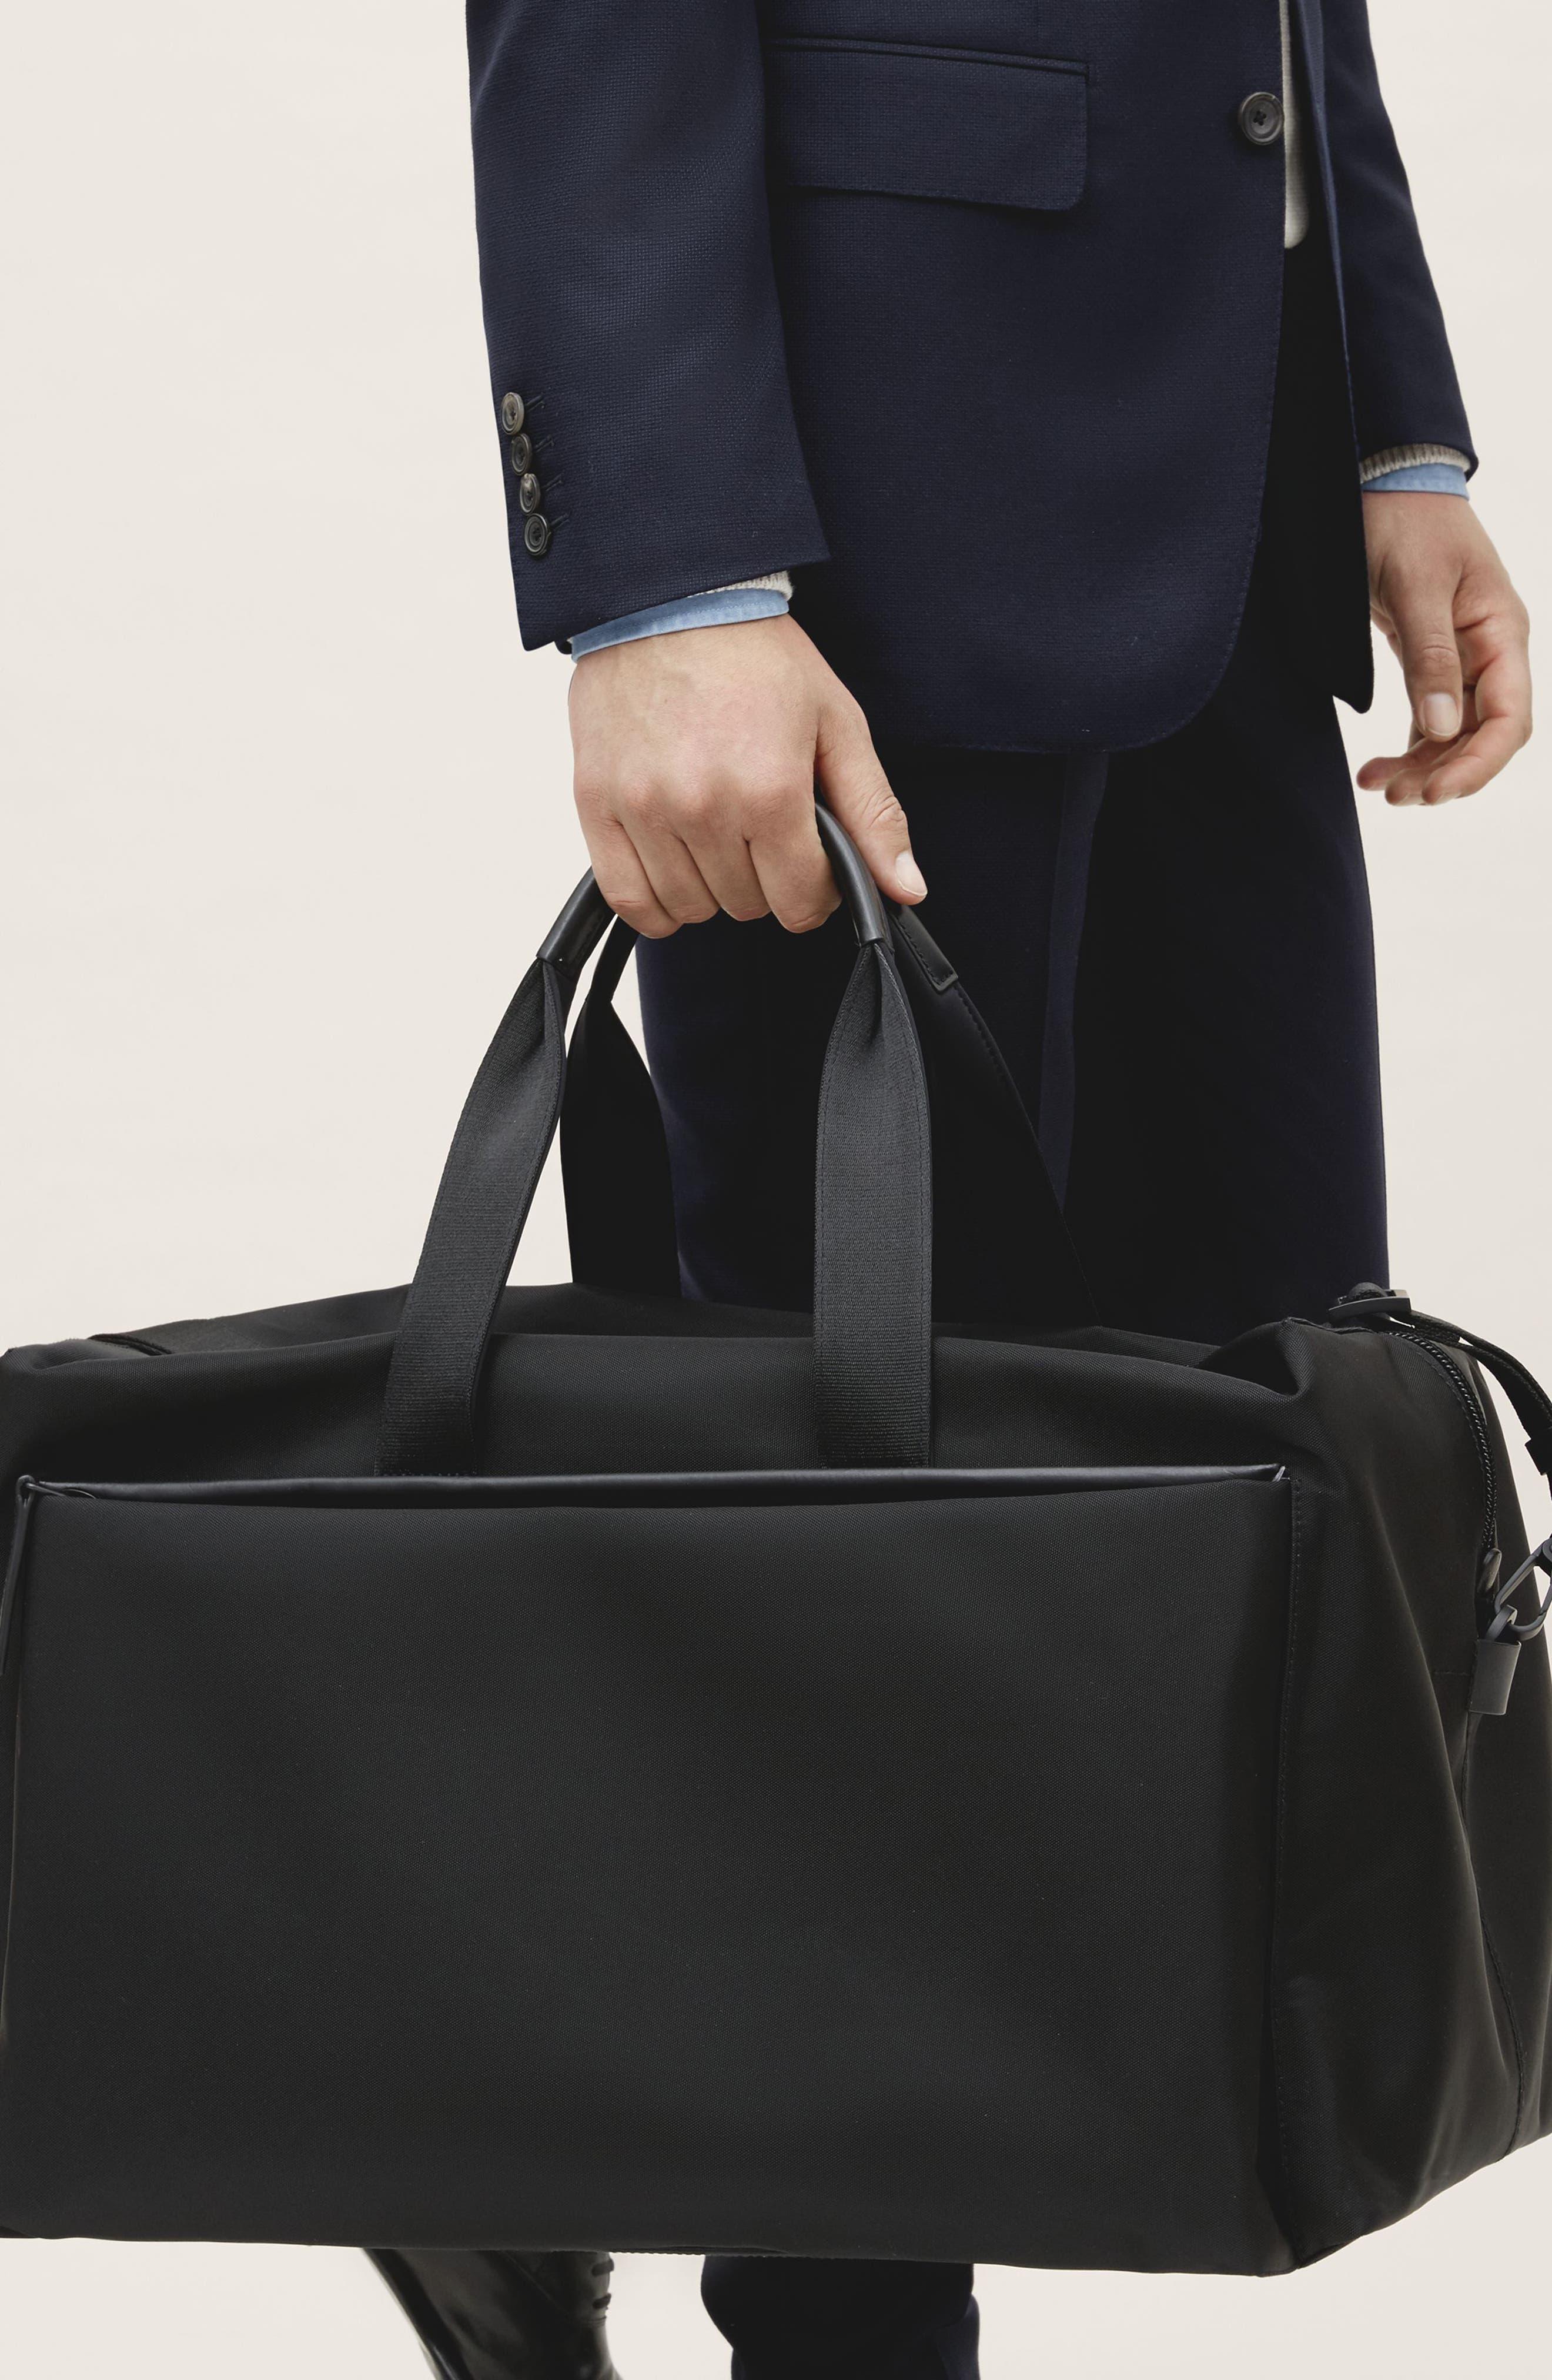 Lightweight Duffel Bag,                             Alternate thumbnail 12, color,                             Black Nylon/ Black Leather